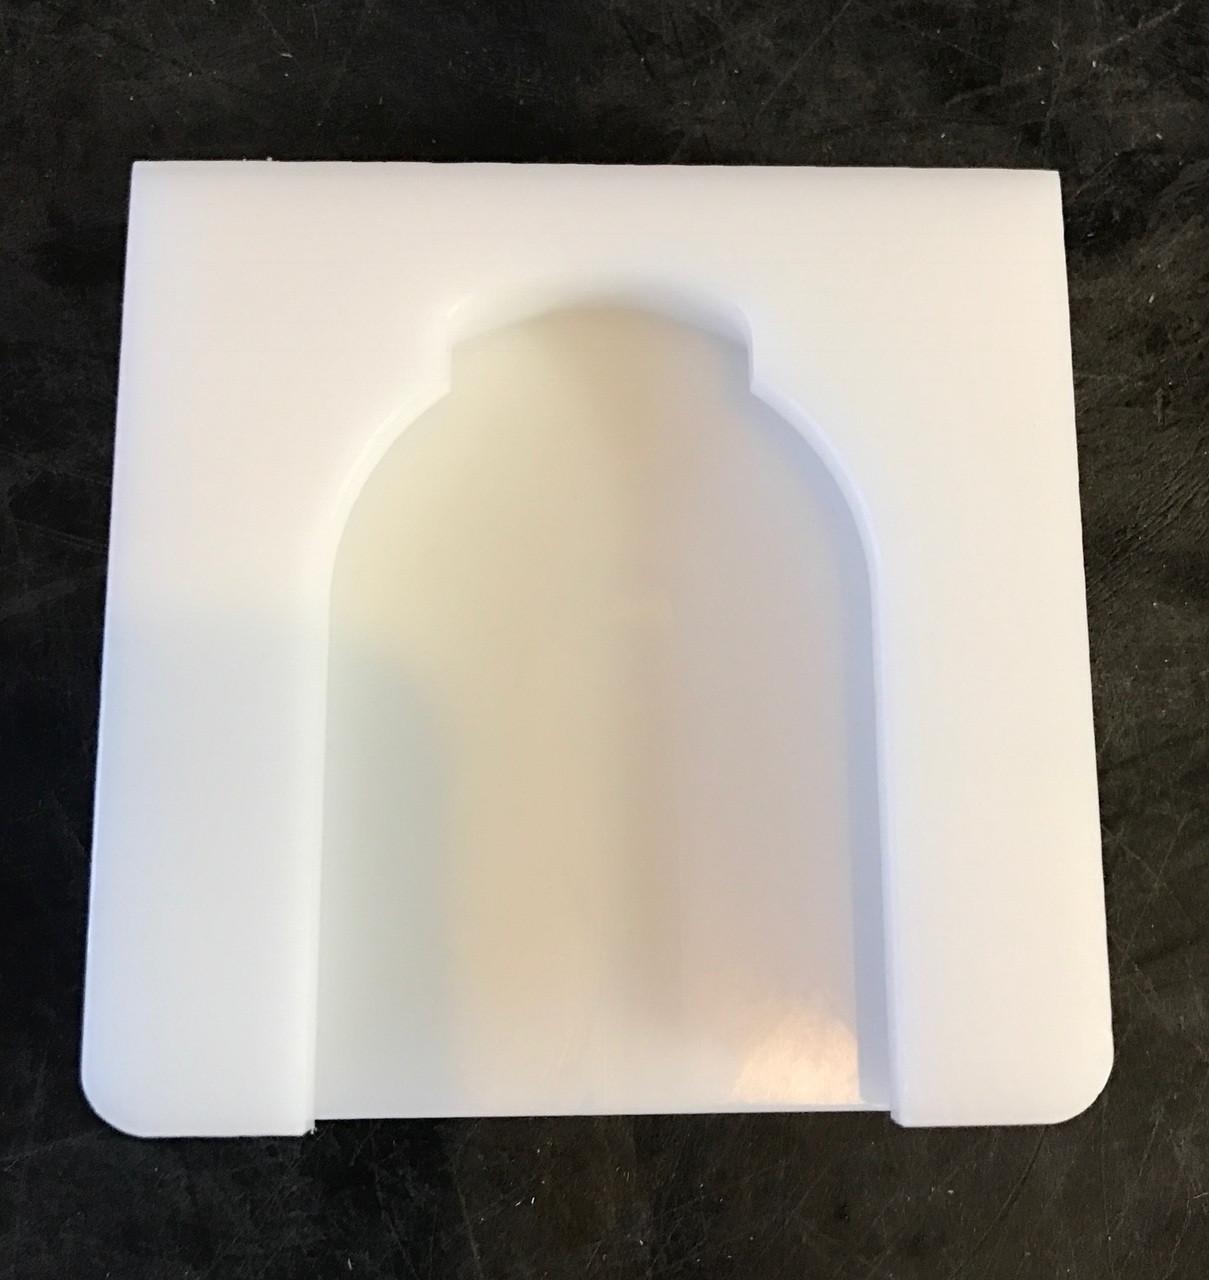 Foodlogistiks MS84.21,MS84.3,C90 & C90+ - Piston Plate - N3.6130.141.0102